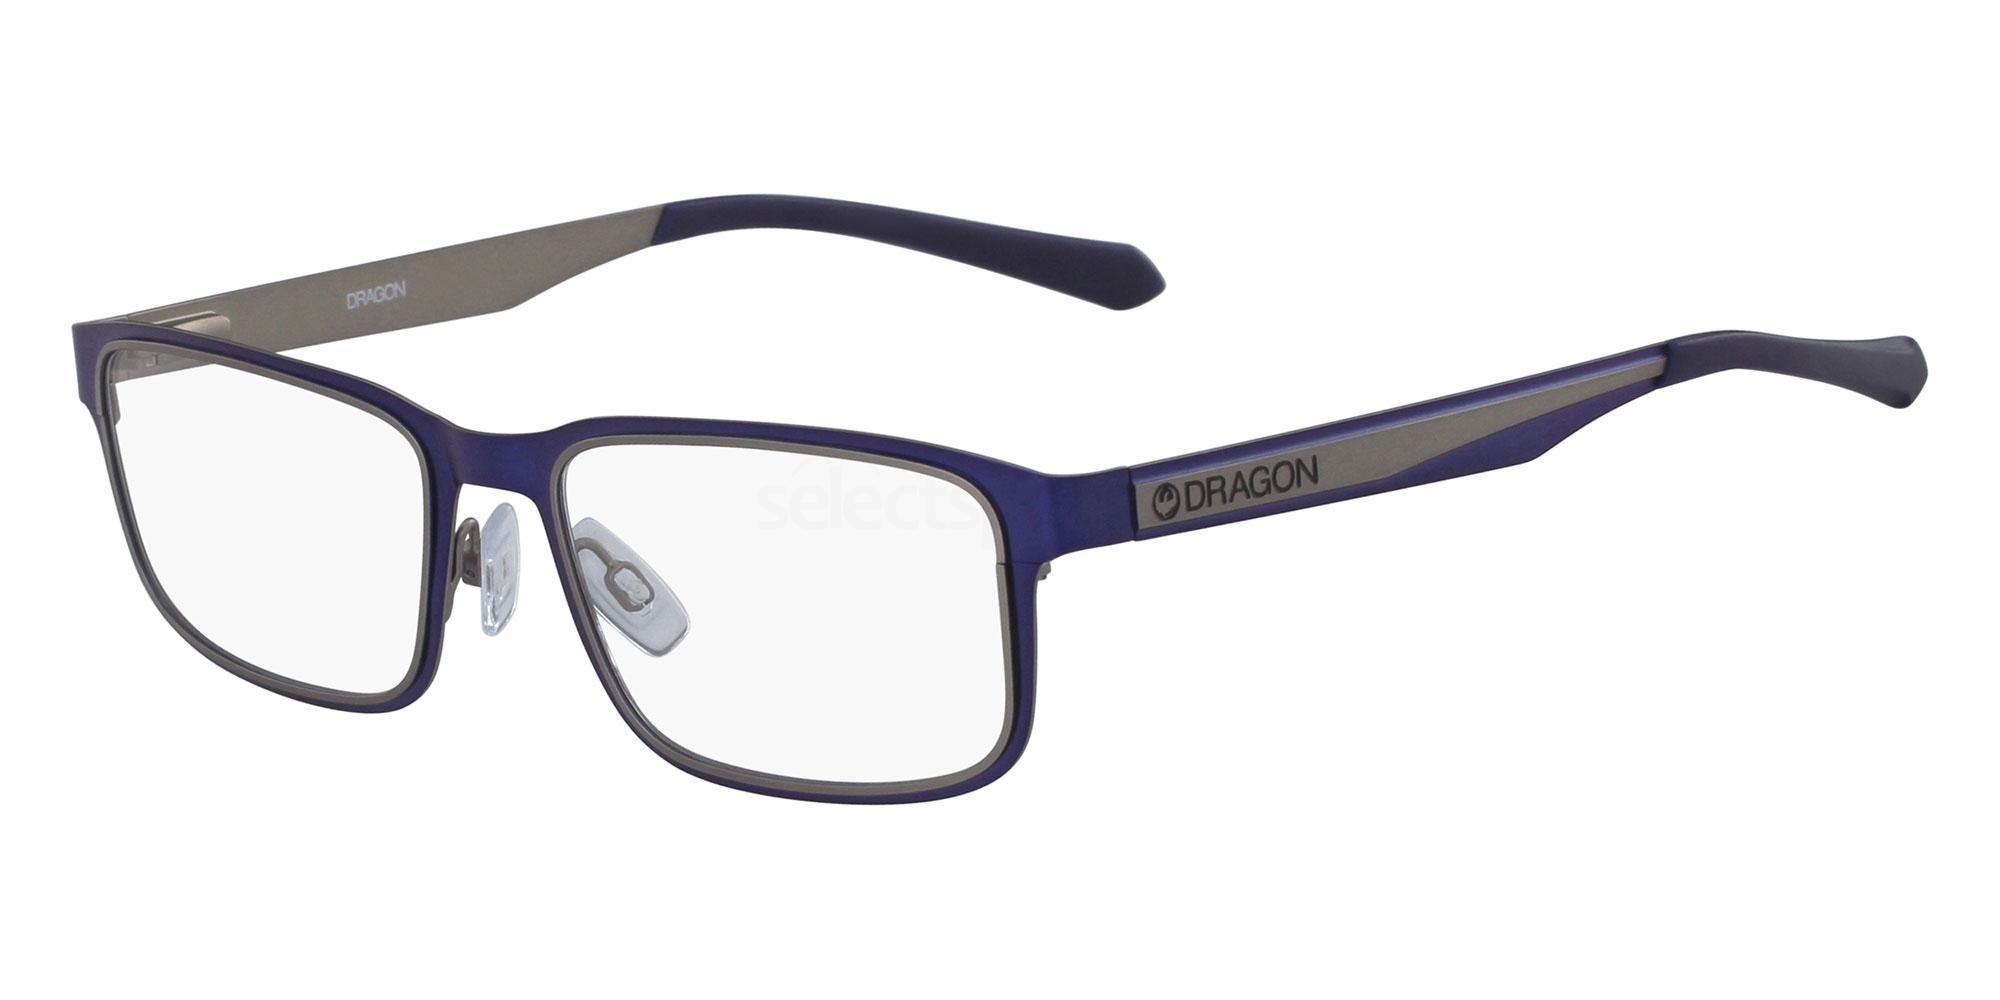 403 DR177 PAUL Glasses, Dragon